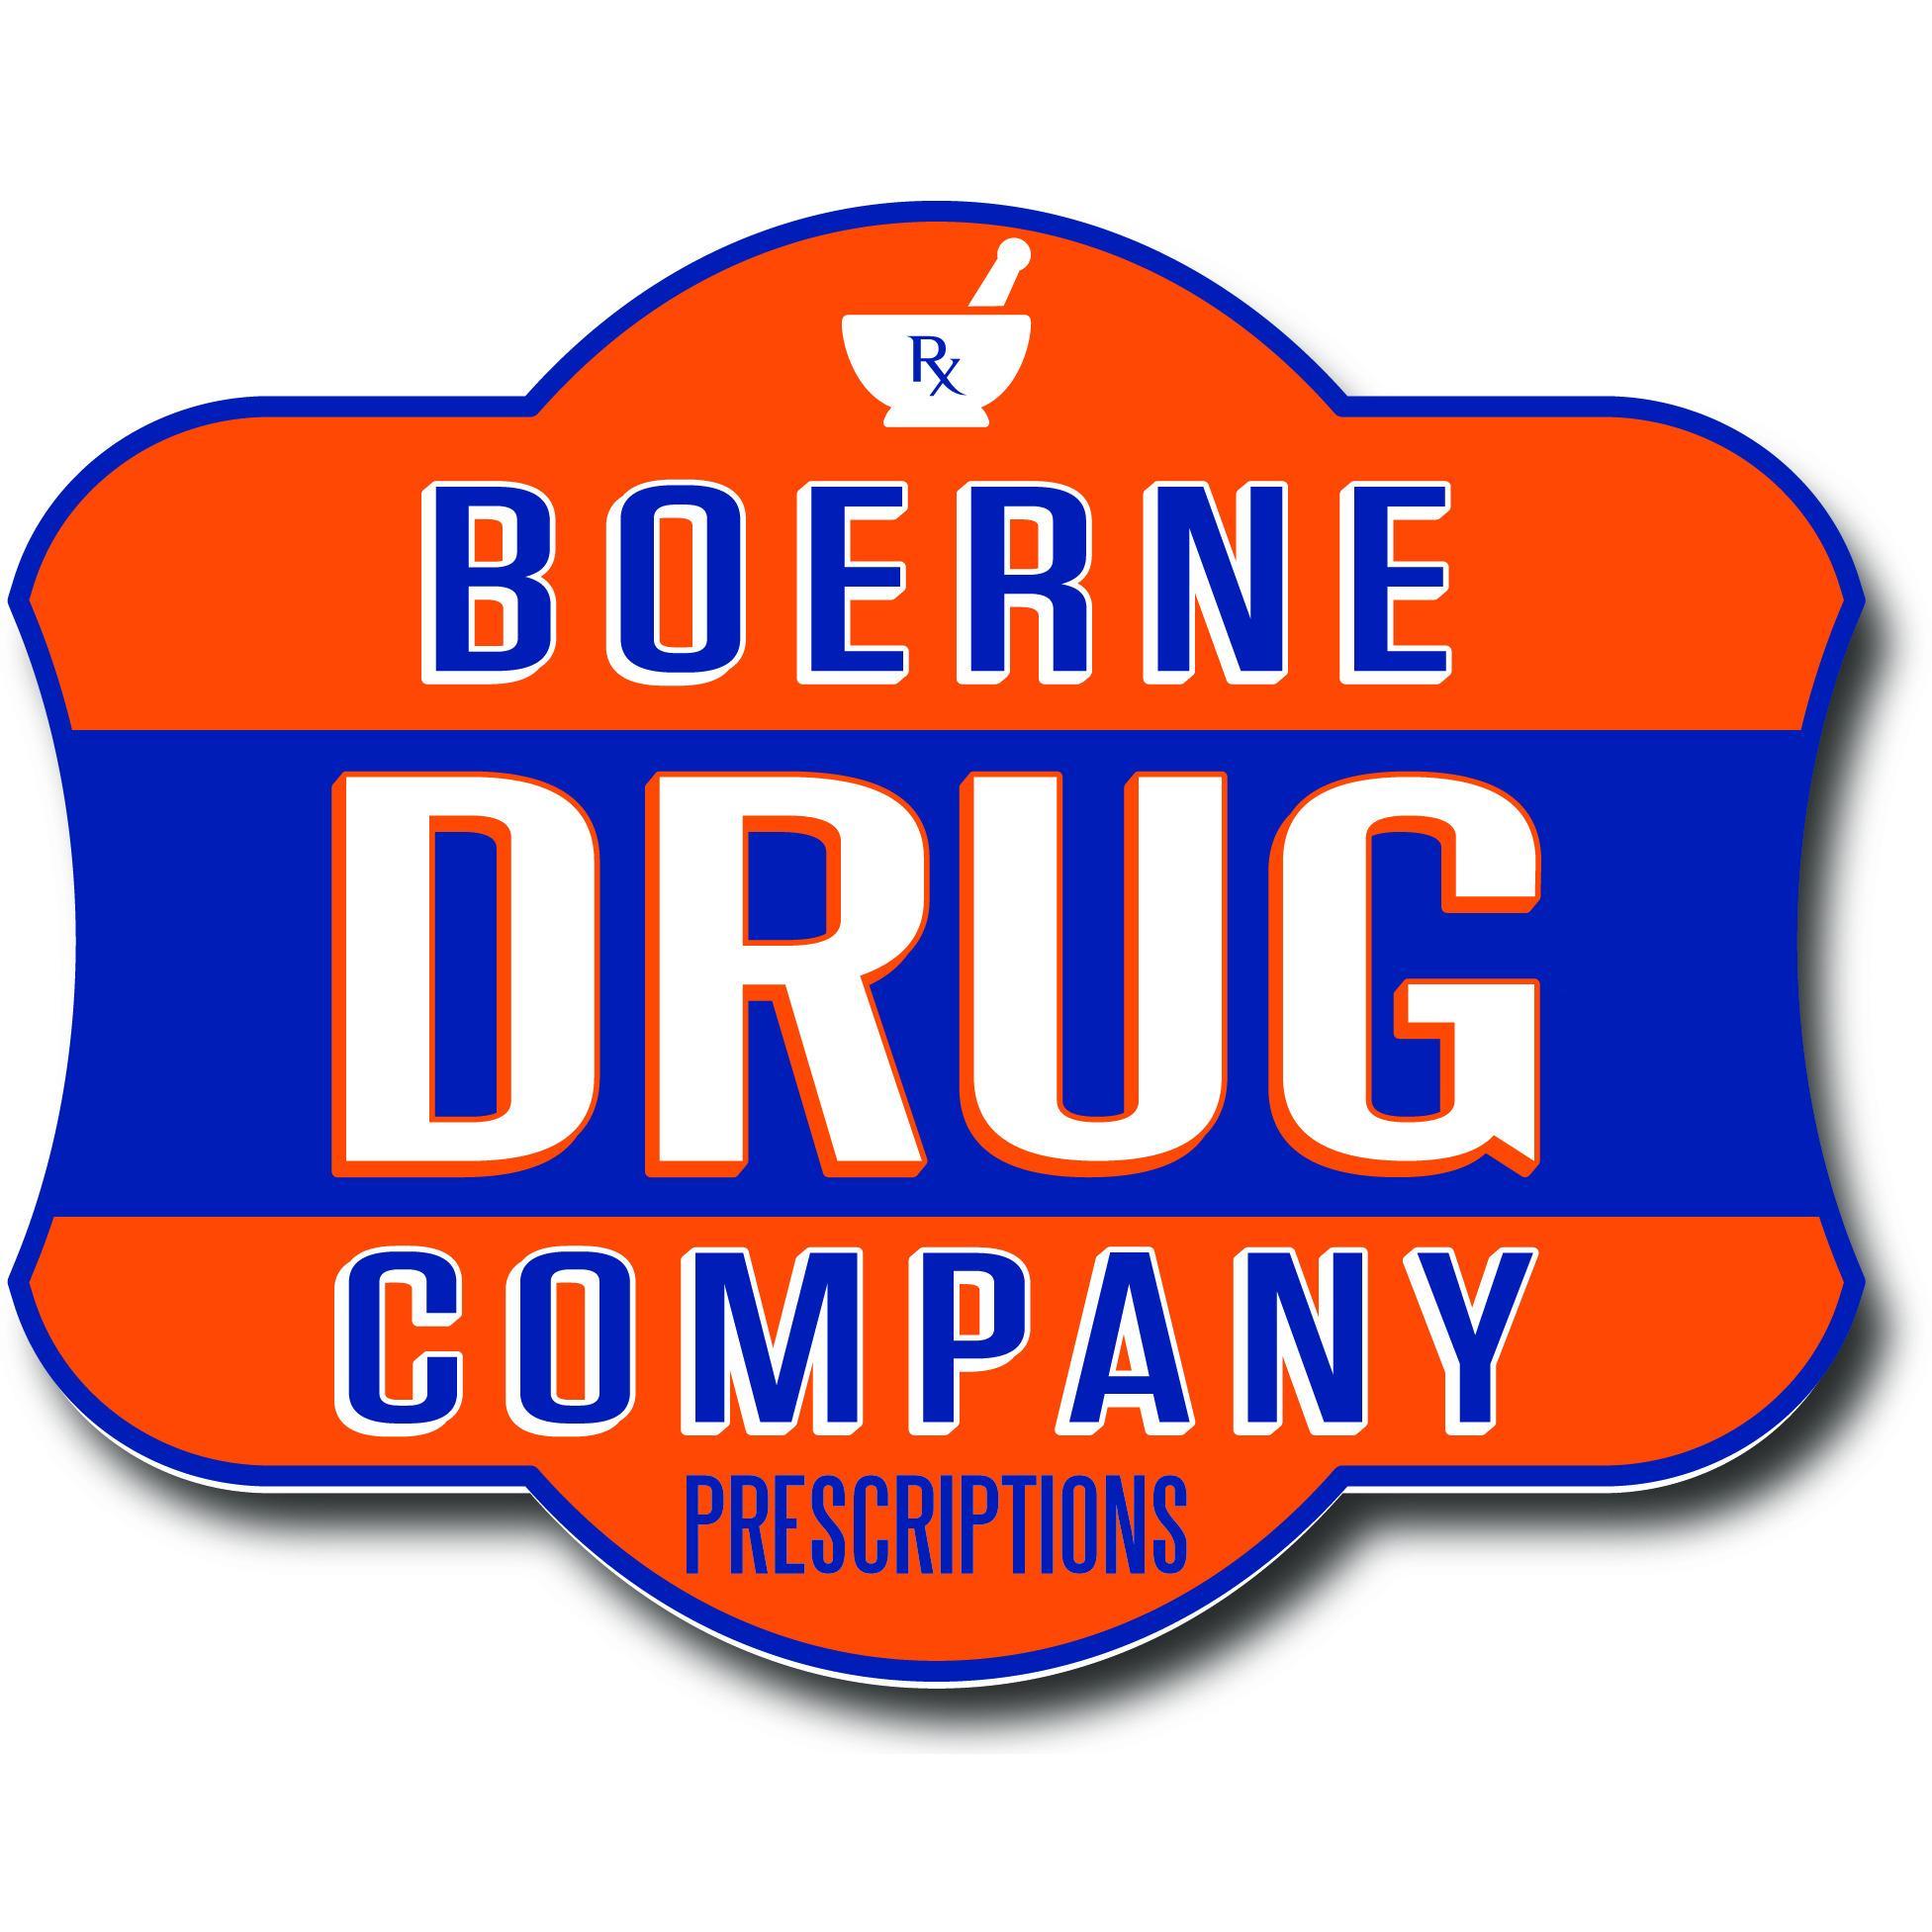 Boerne Drug Company